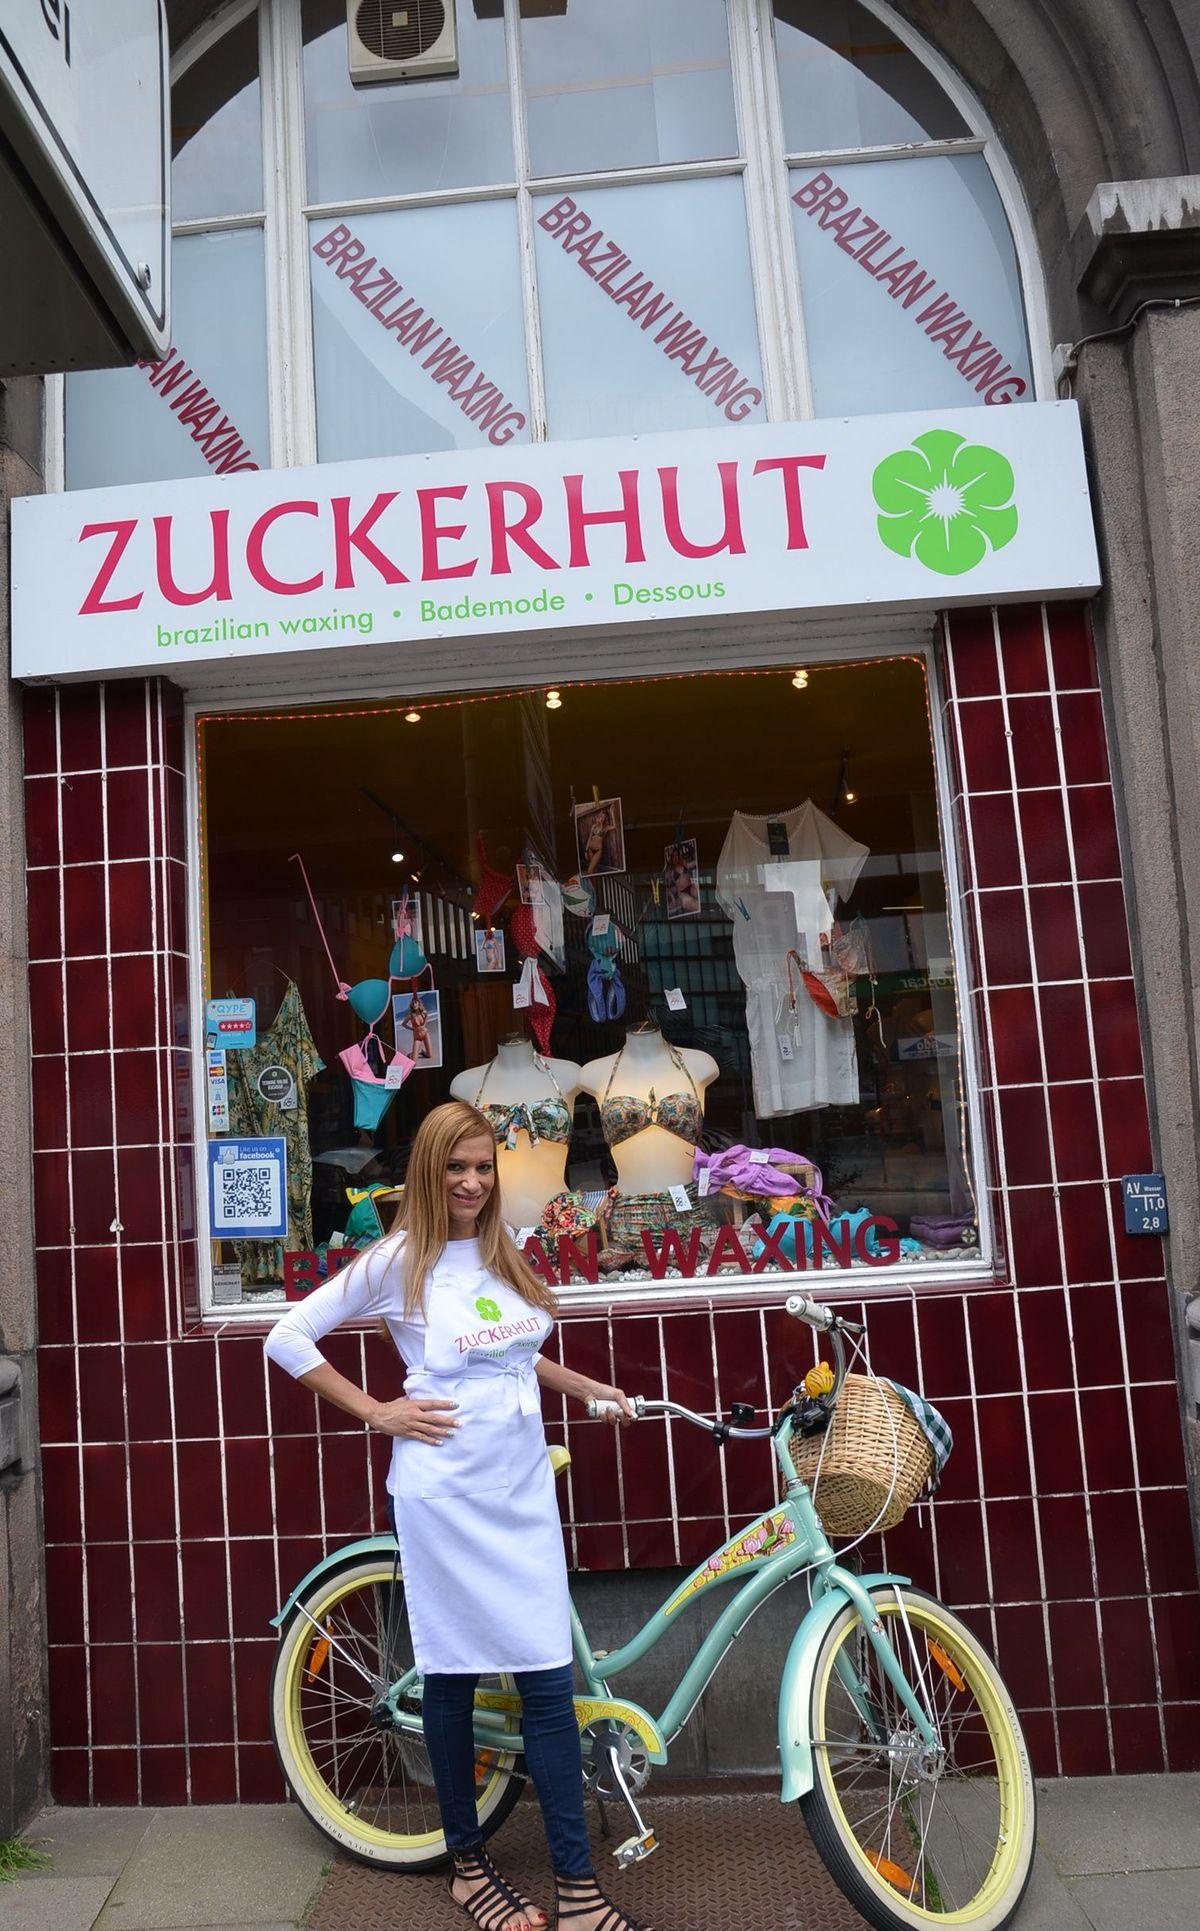 Zuckerhut Brazilian Waxing & Brasilianische Bademode